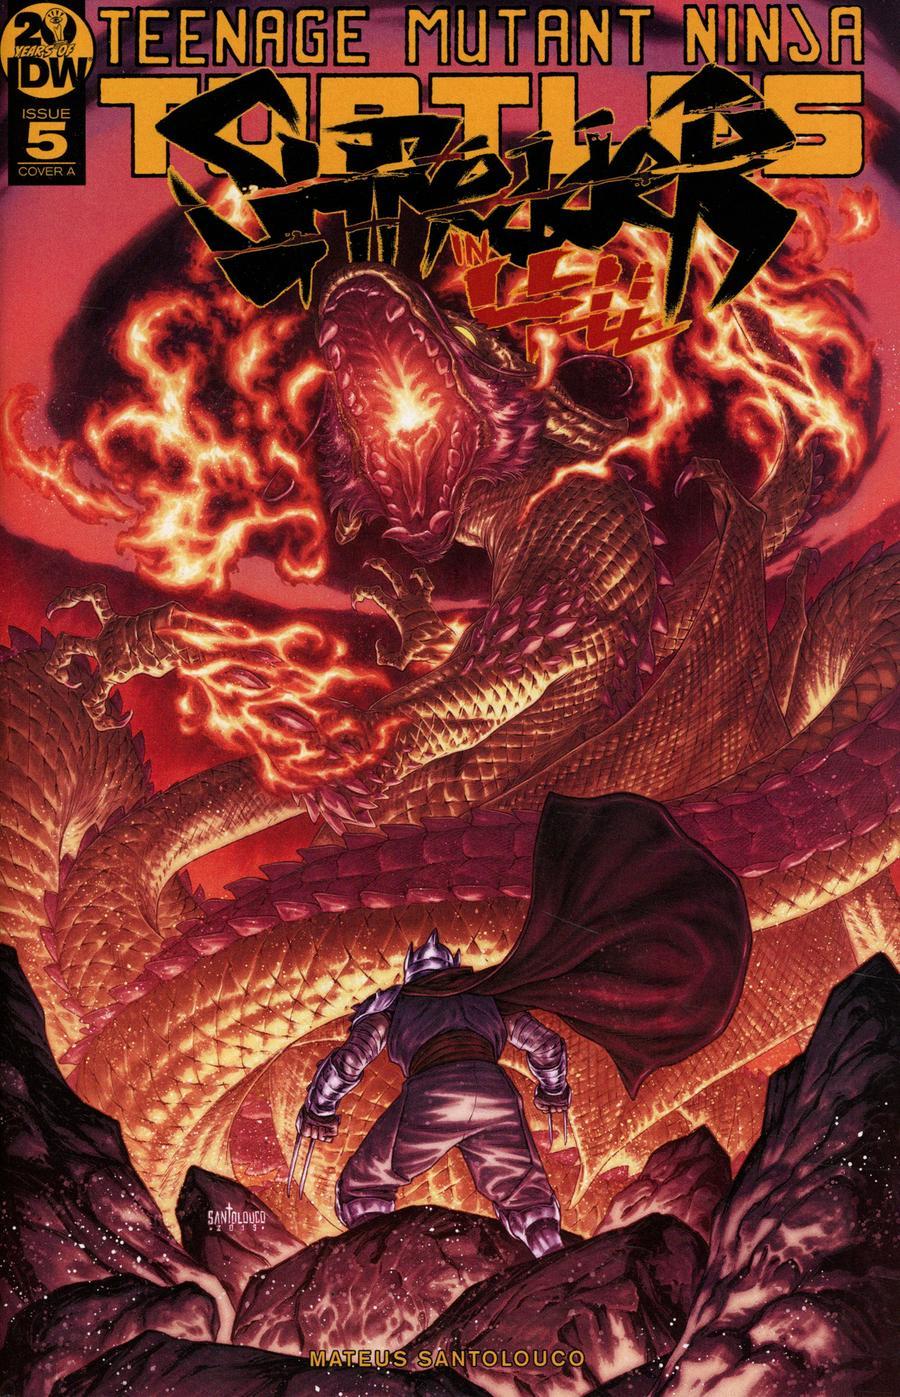 Teenage Mutant Ninja Turtles Shredder In Hell #5 Cover A Regular Mateus Santolouco Cover